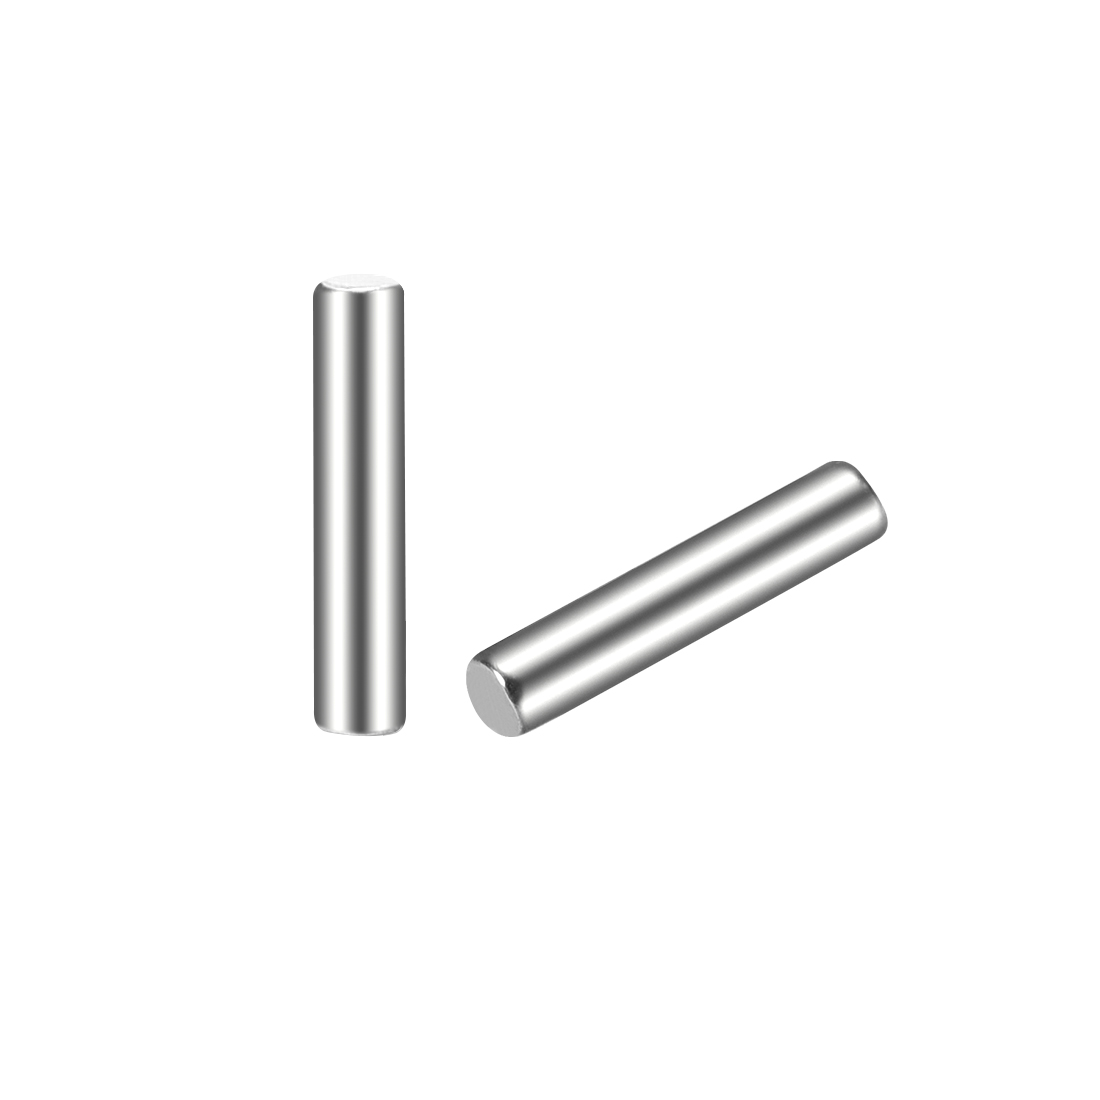 15Pcs 2mm x 10mm Dowel Pin 304 Stainless Steel Shelf Support Pin Fasten